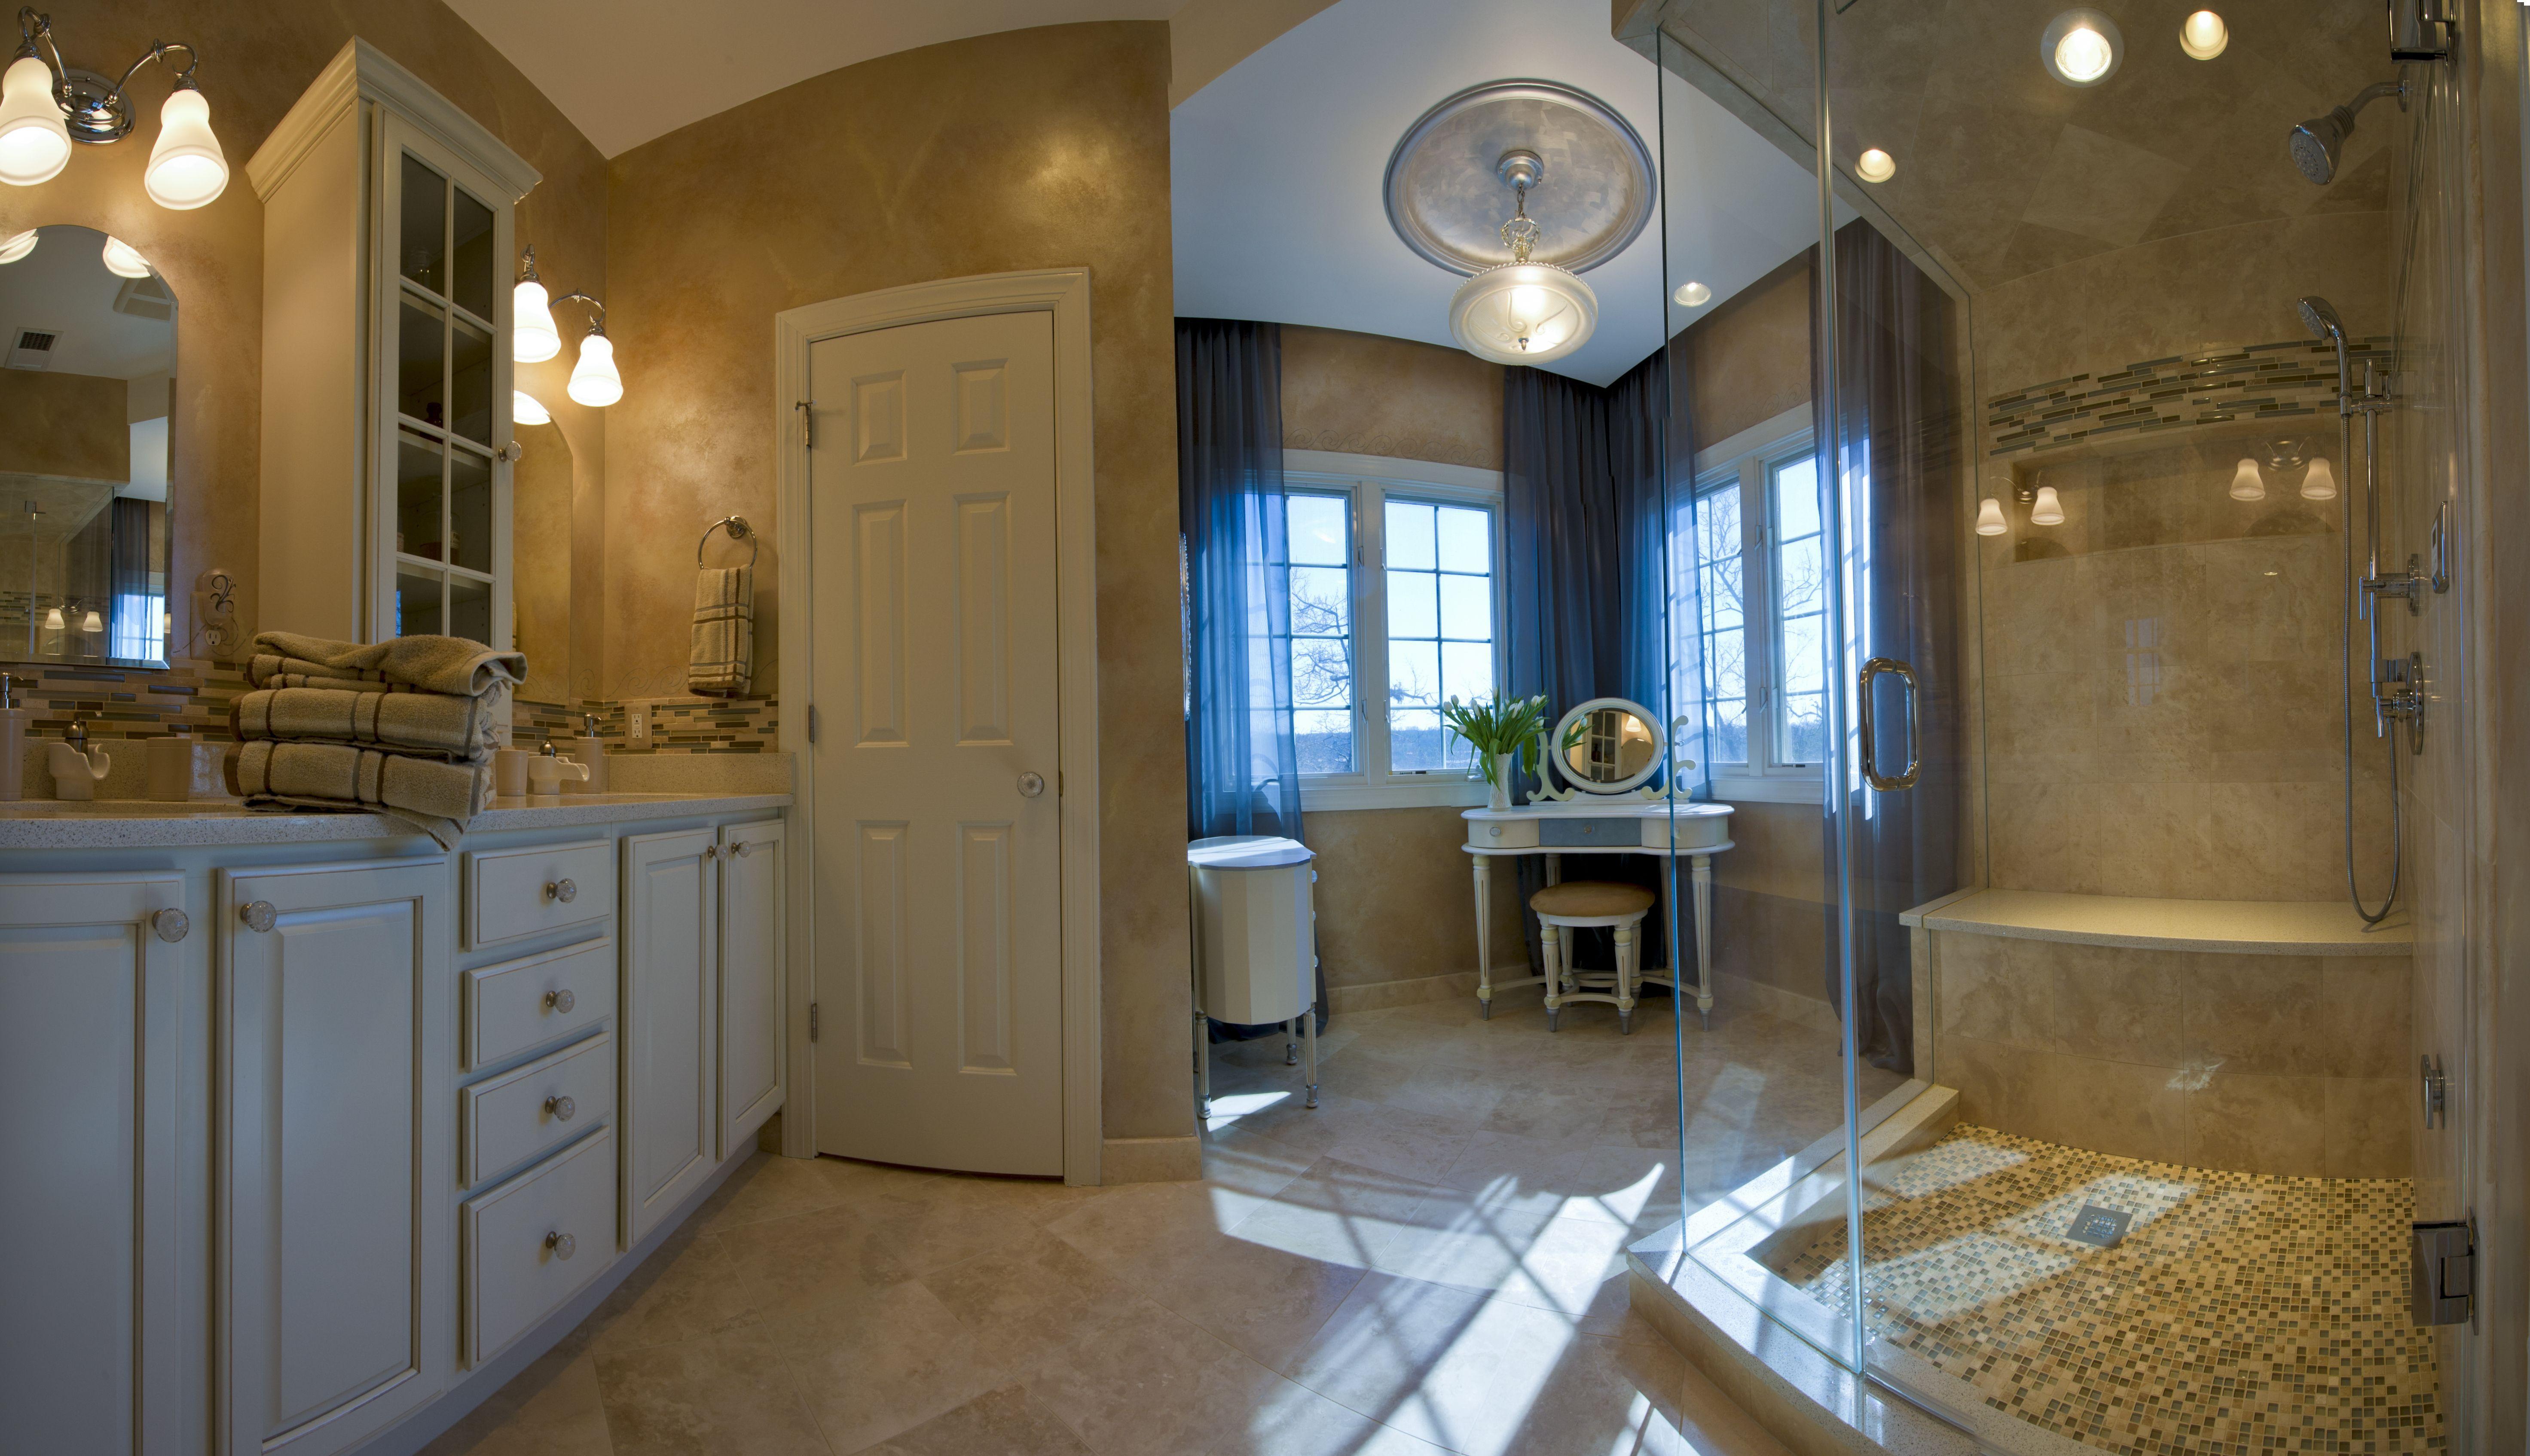 Master Bathroom Remodel in Alexandria, Virginia | Home ...